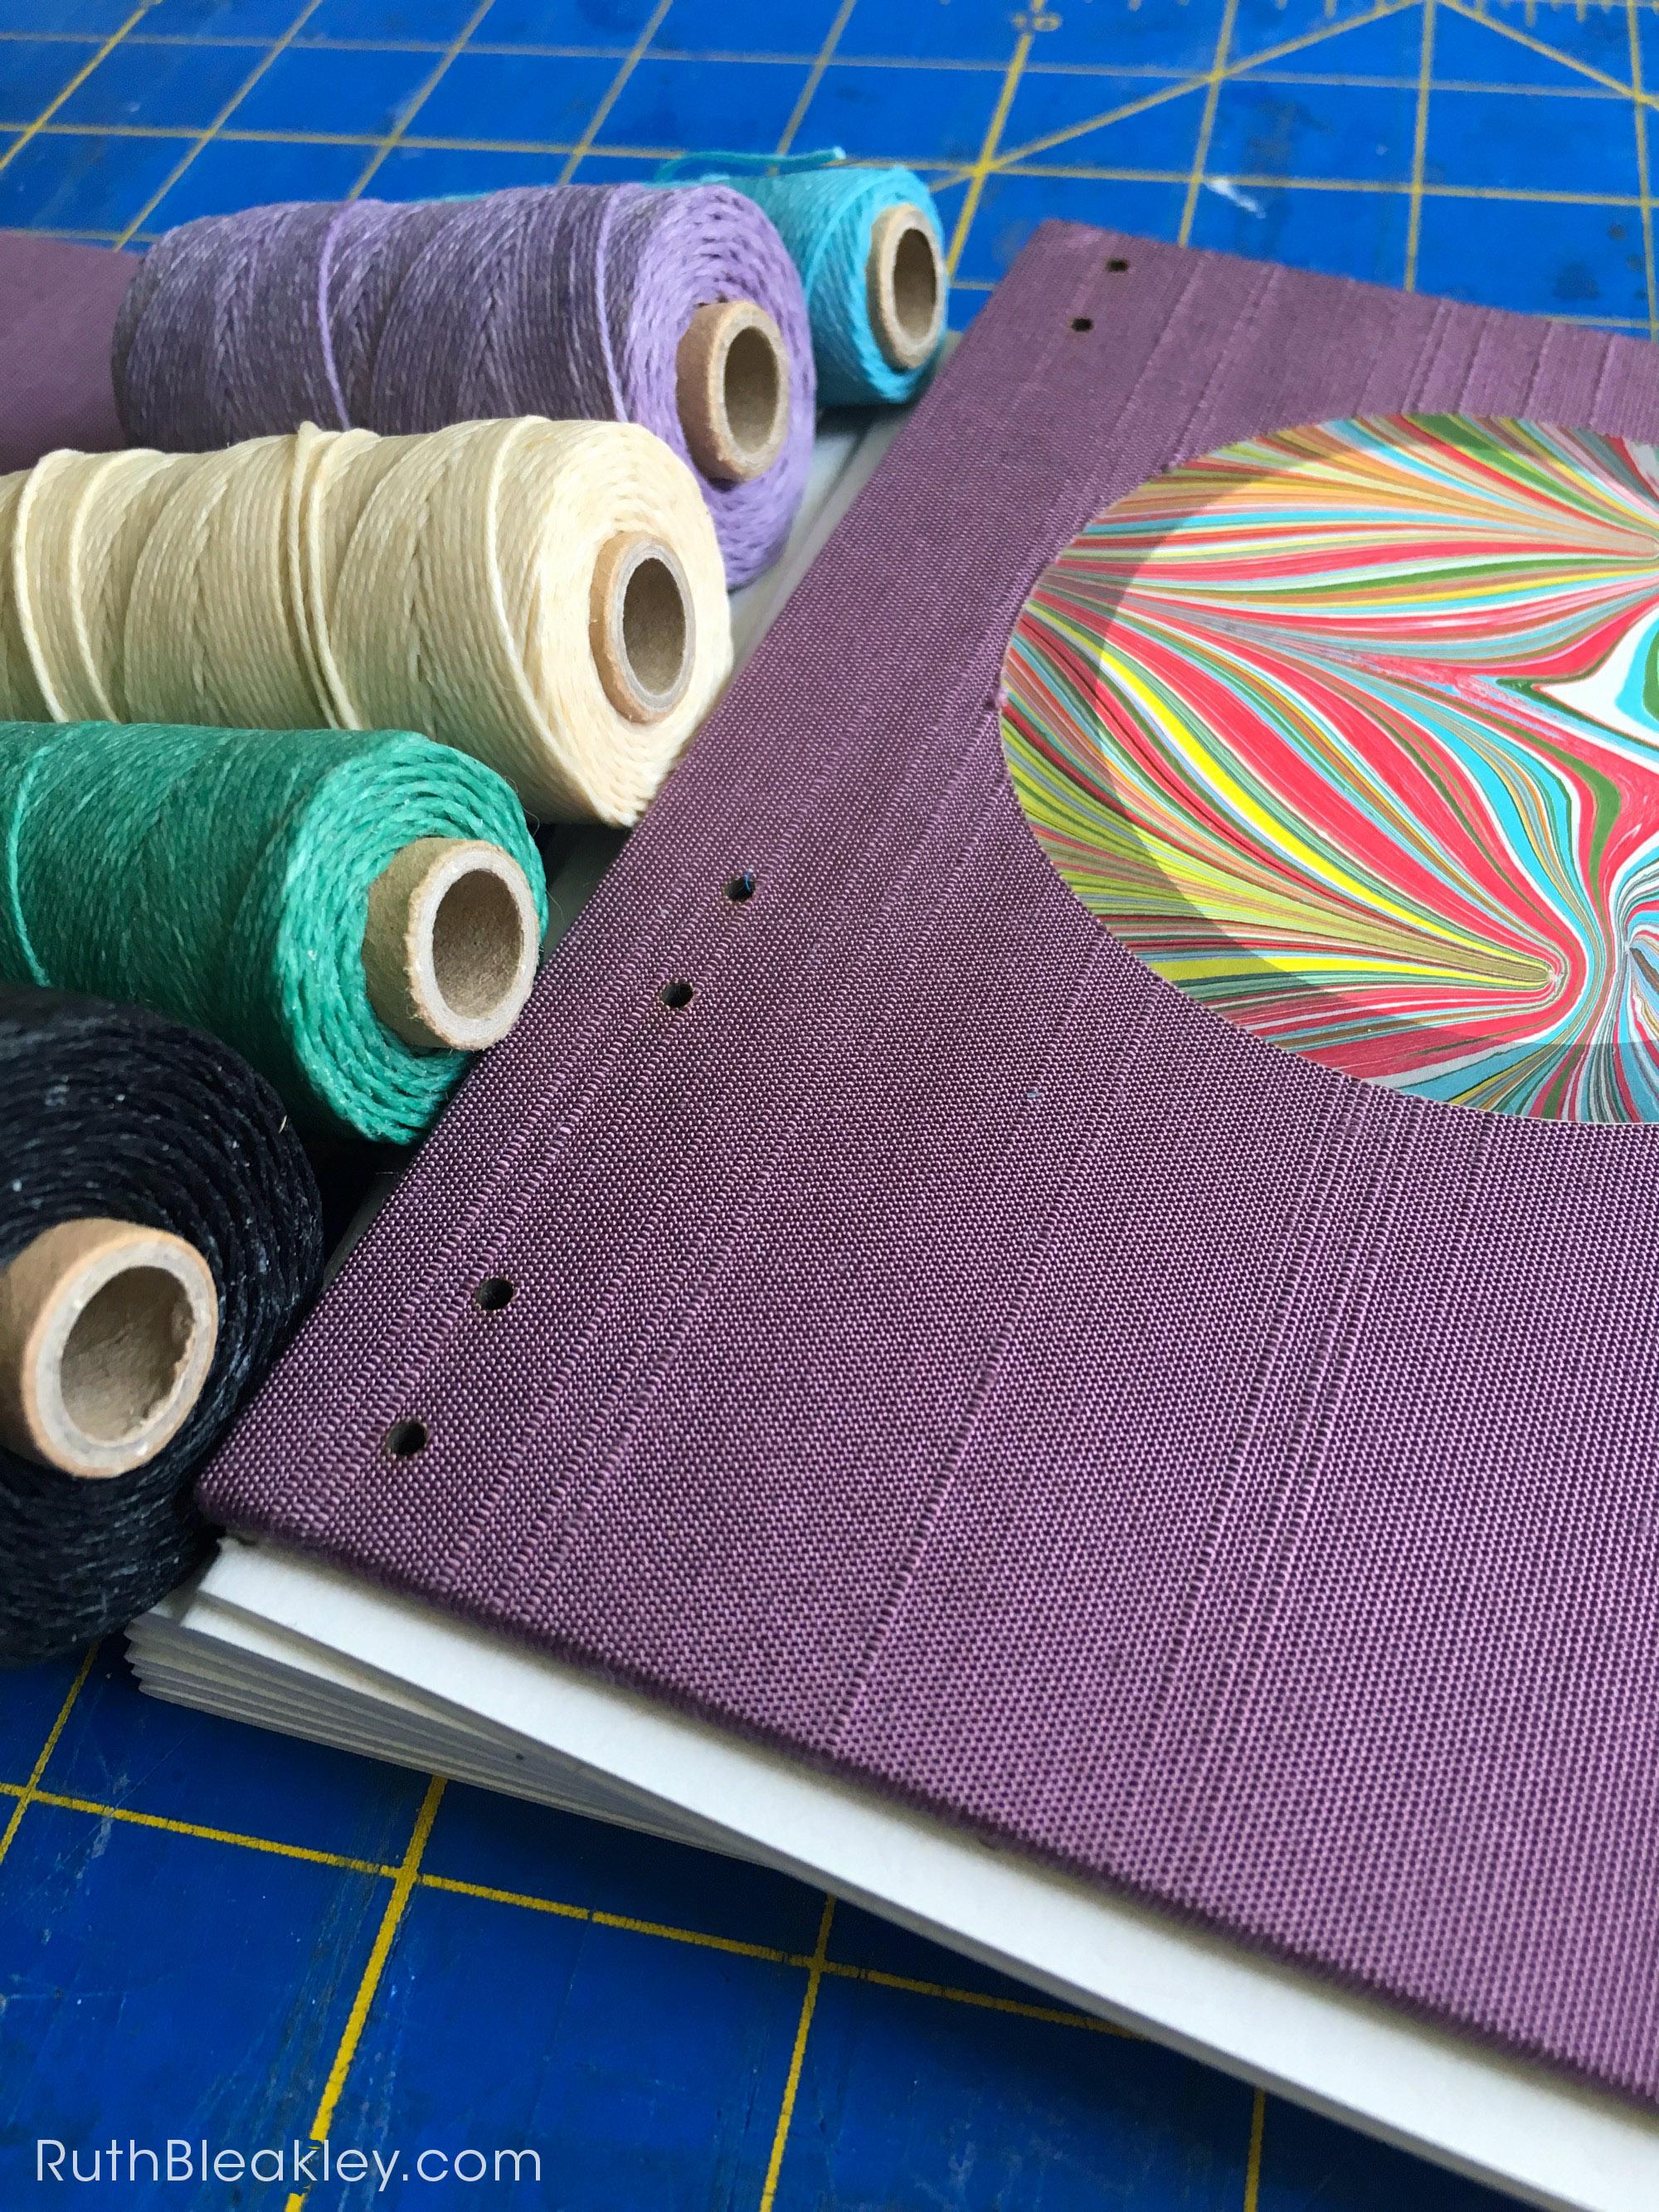 choosing thread bookbinding process by Ruth Bleakley